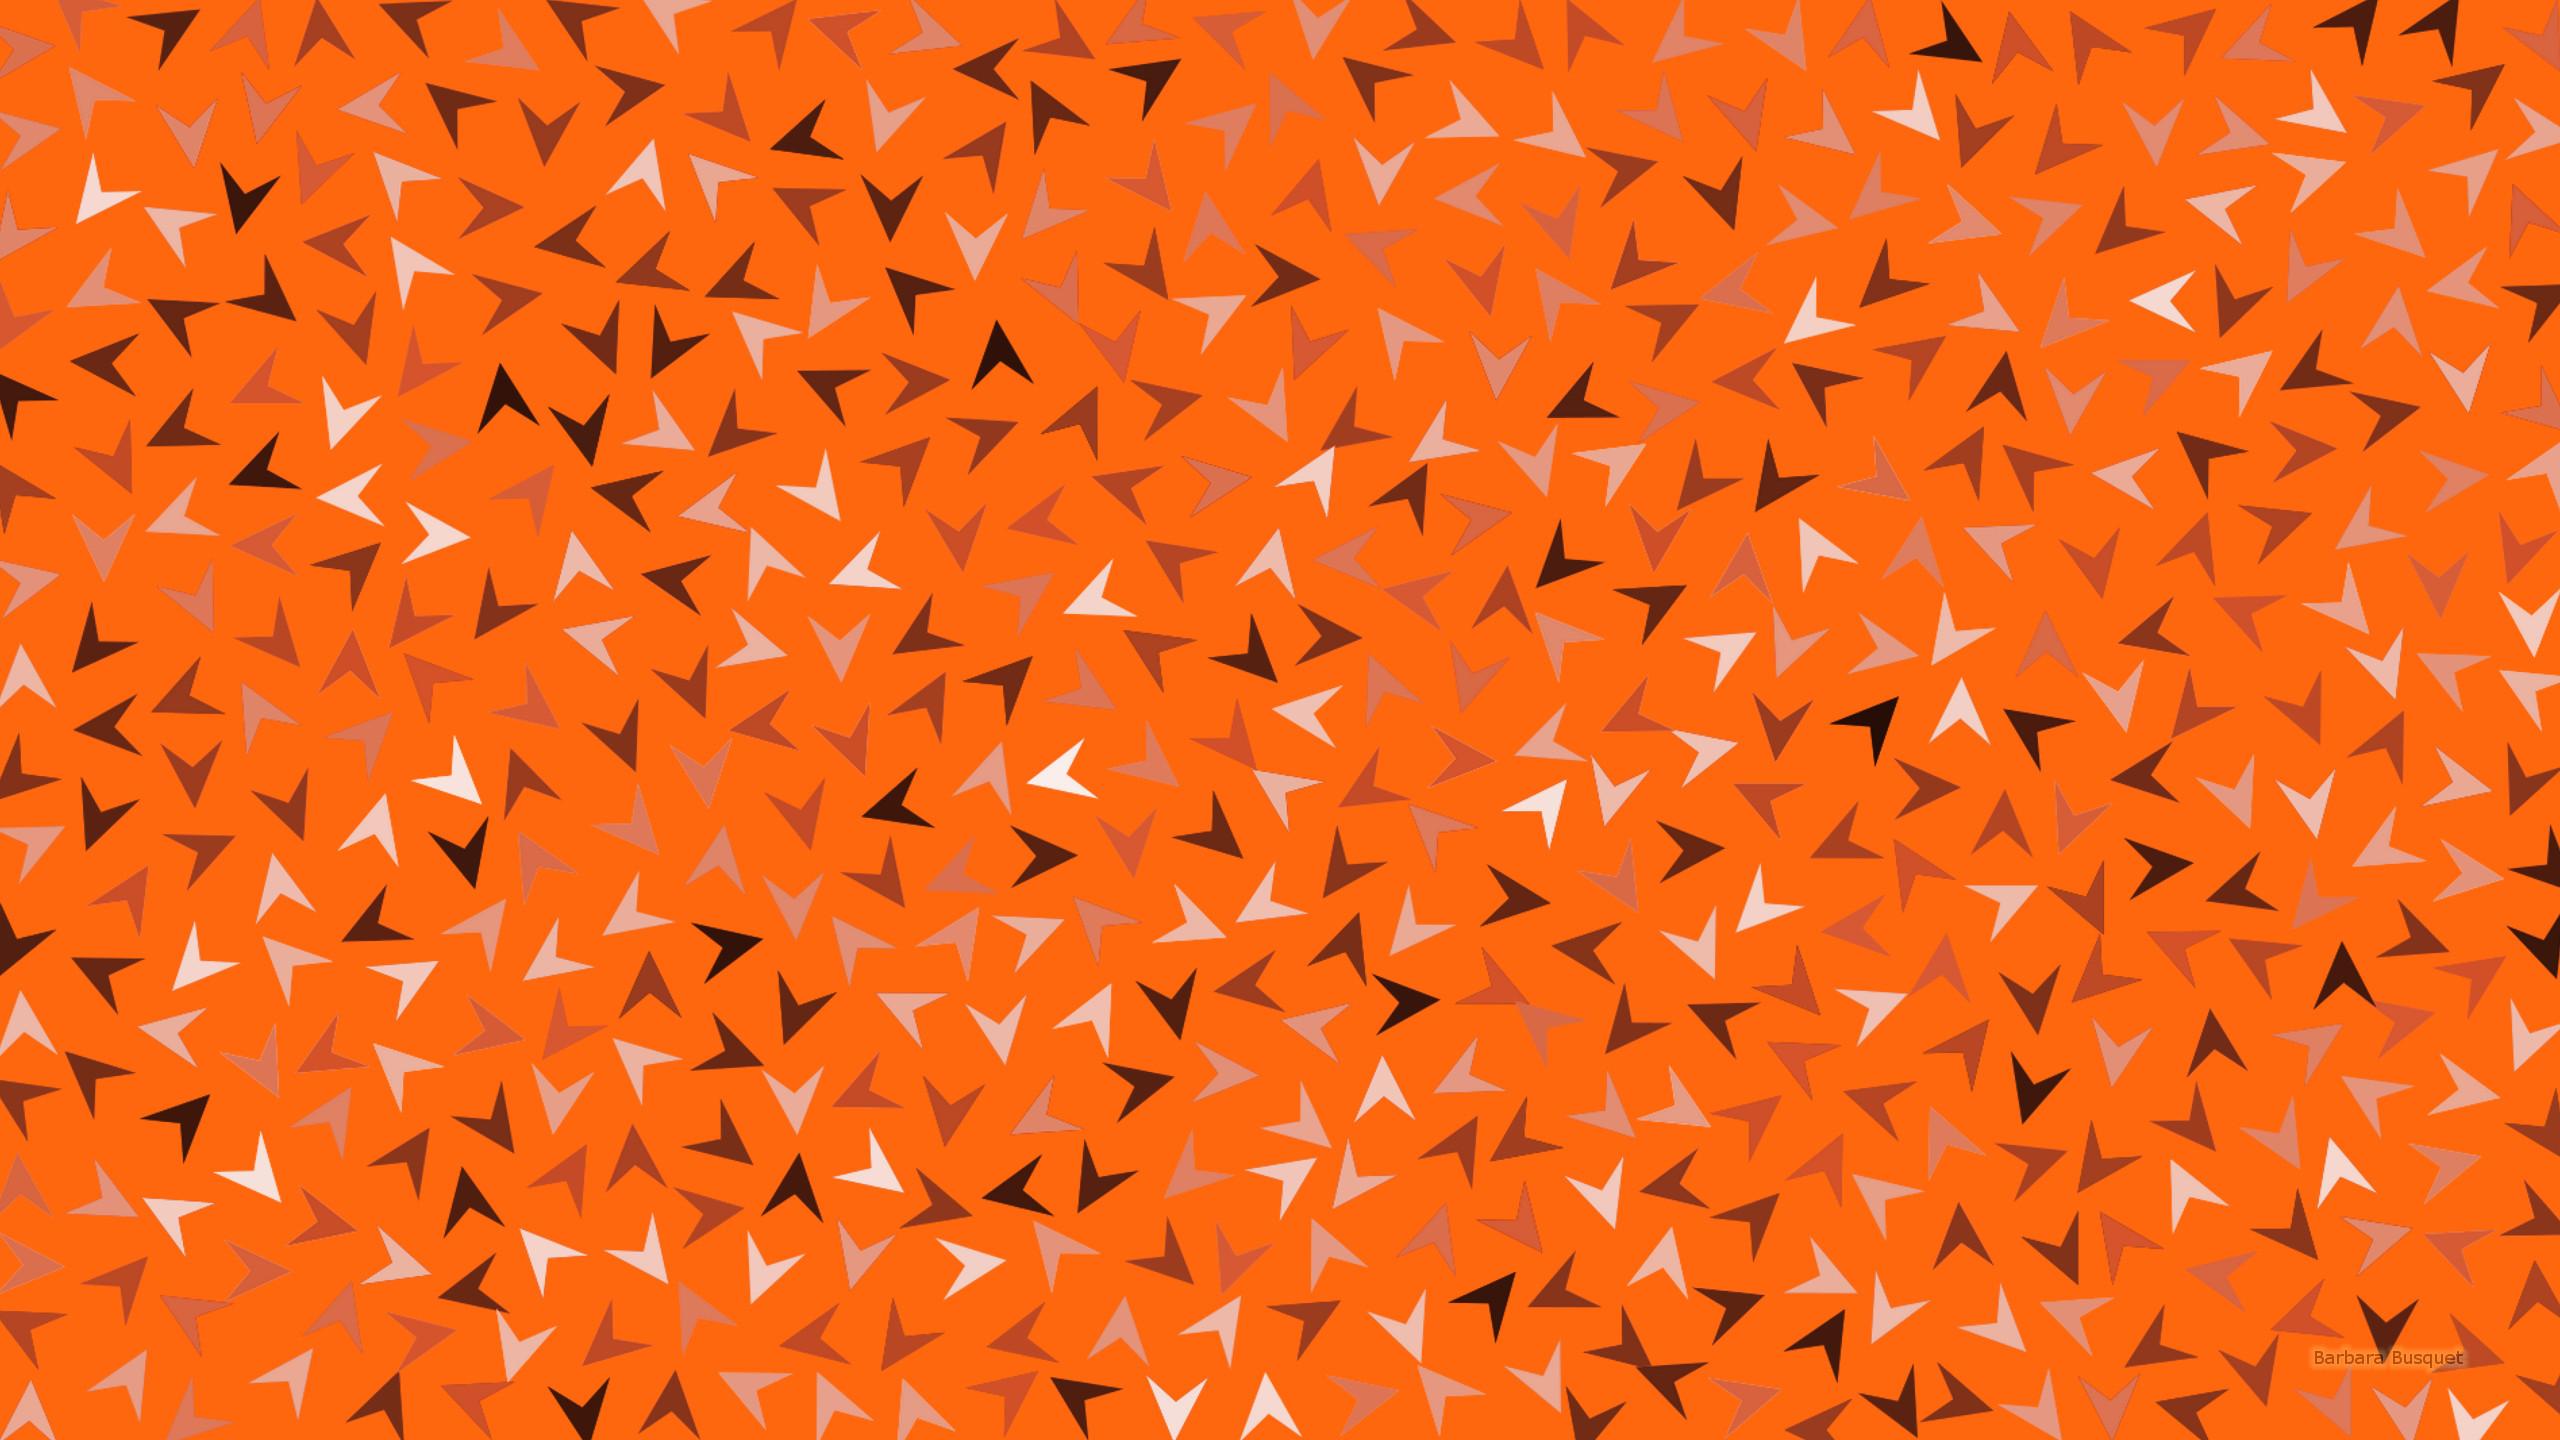 Orange Wallpapers Barbaras Hd Wallpapers